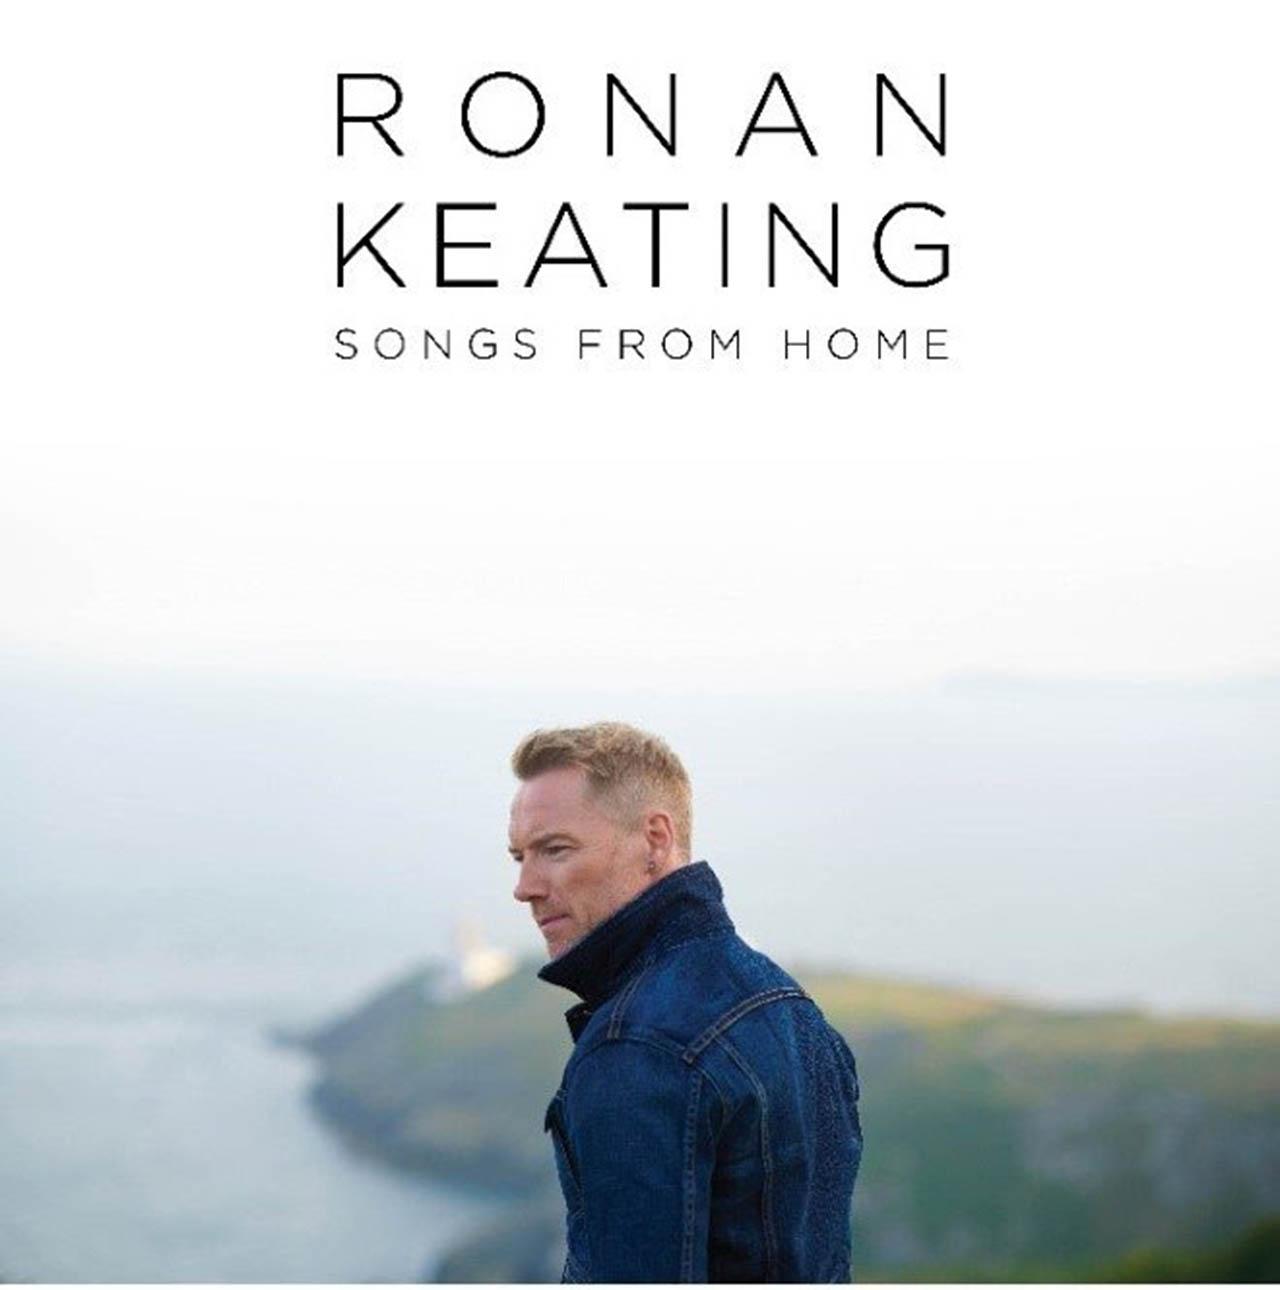 Ronan Keating - Songs from Home